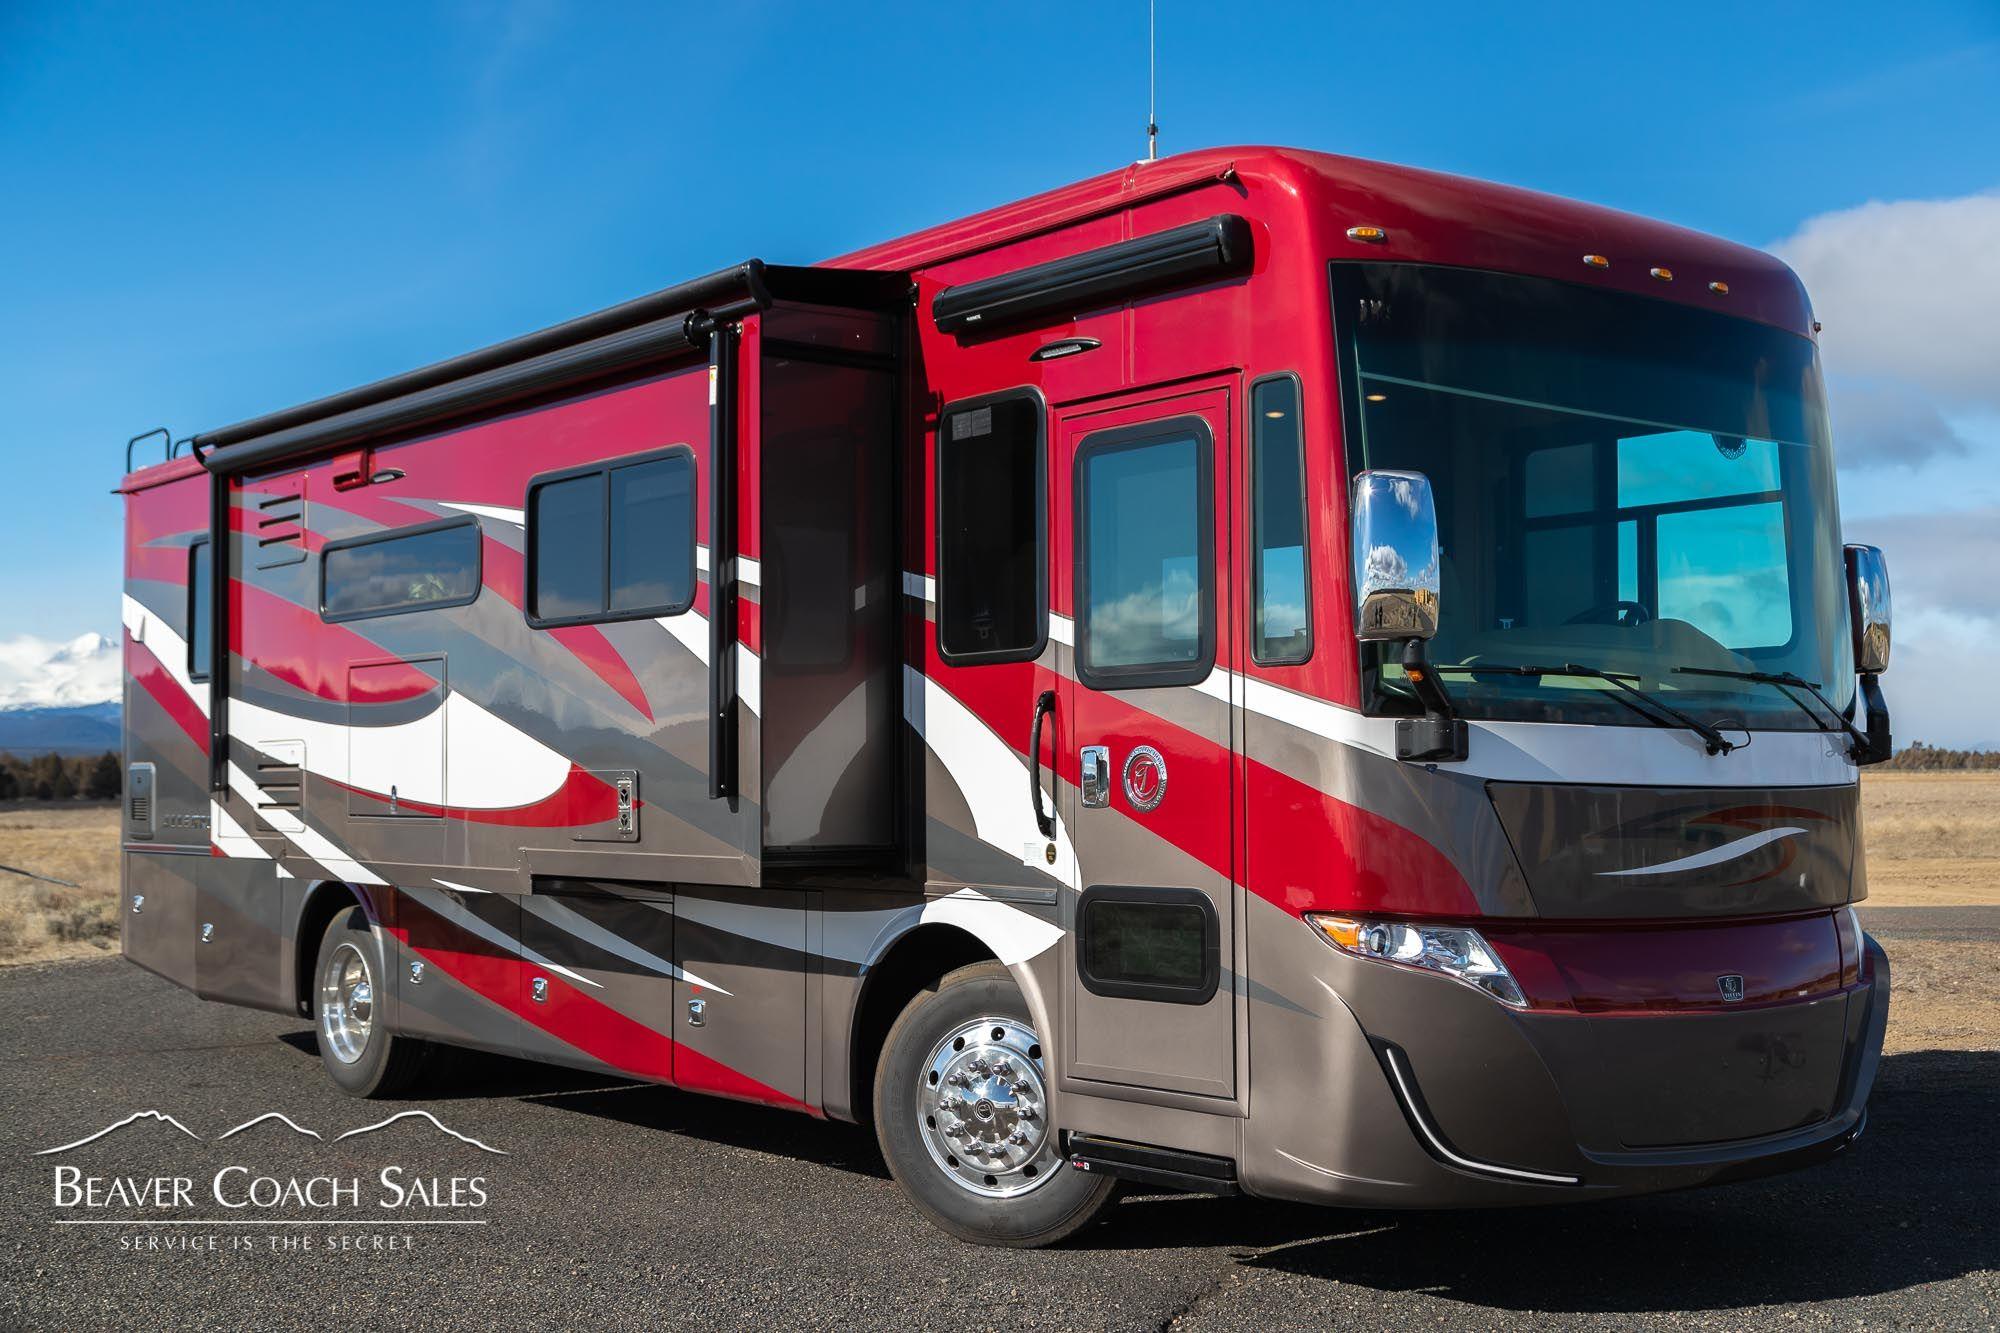 New In Inventory 2020 Tiffin Motorhomes Allegro Red 340 33 Al In